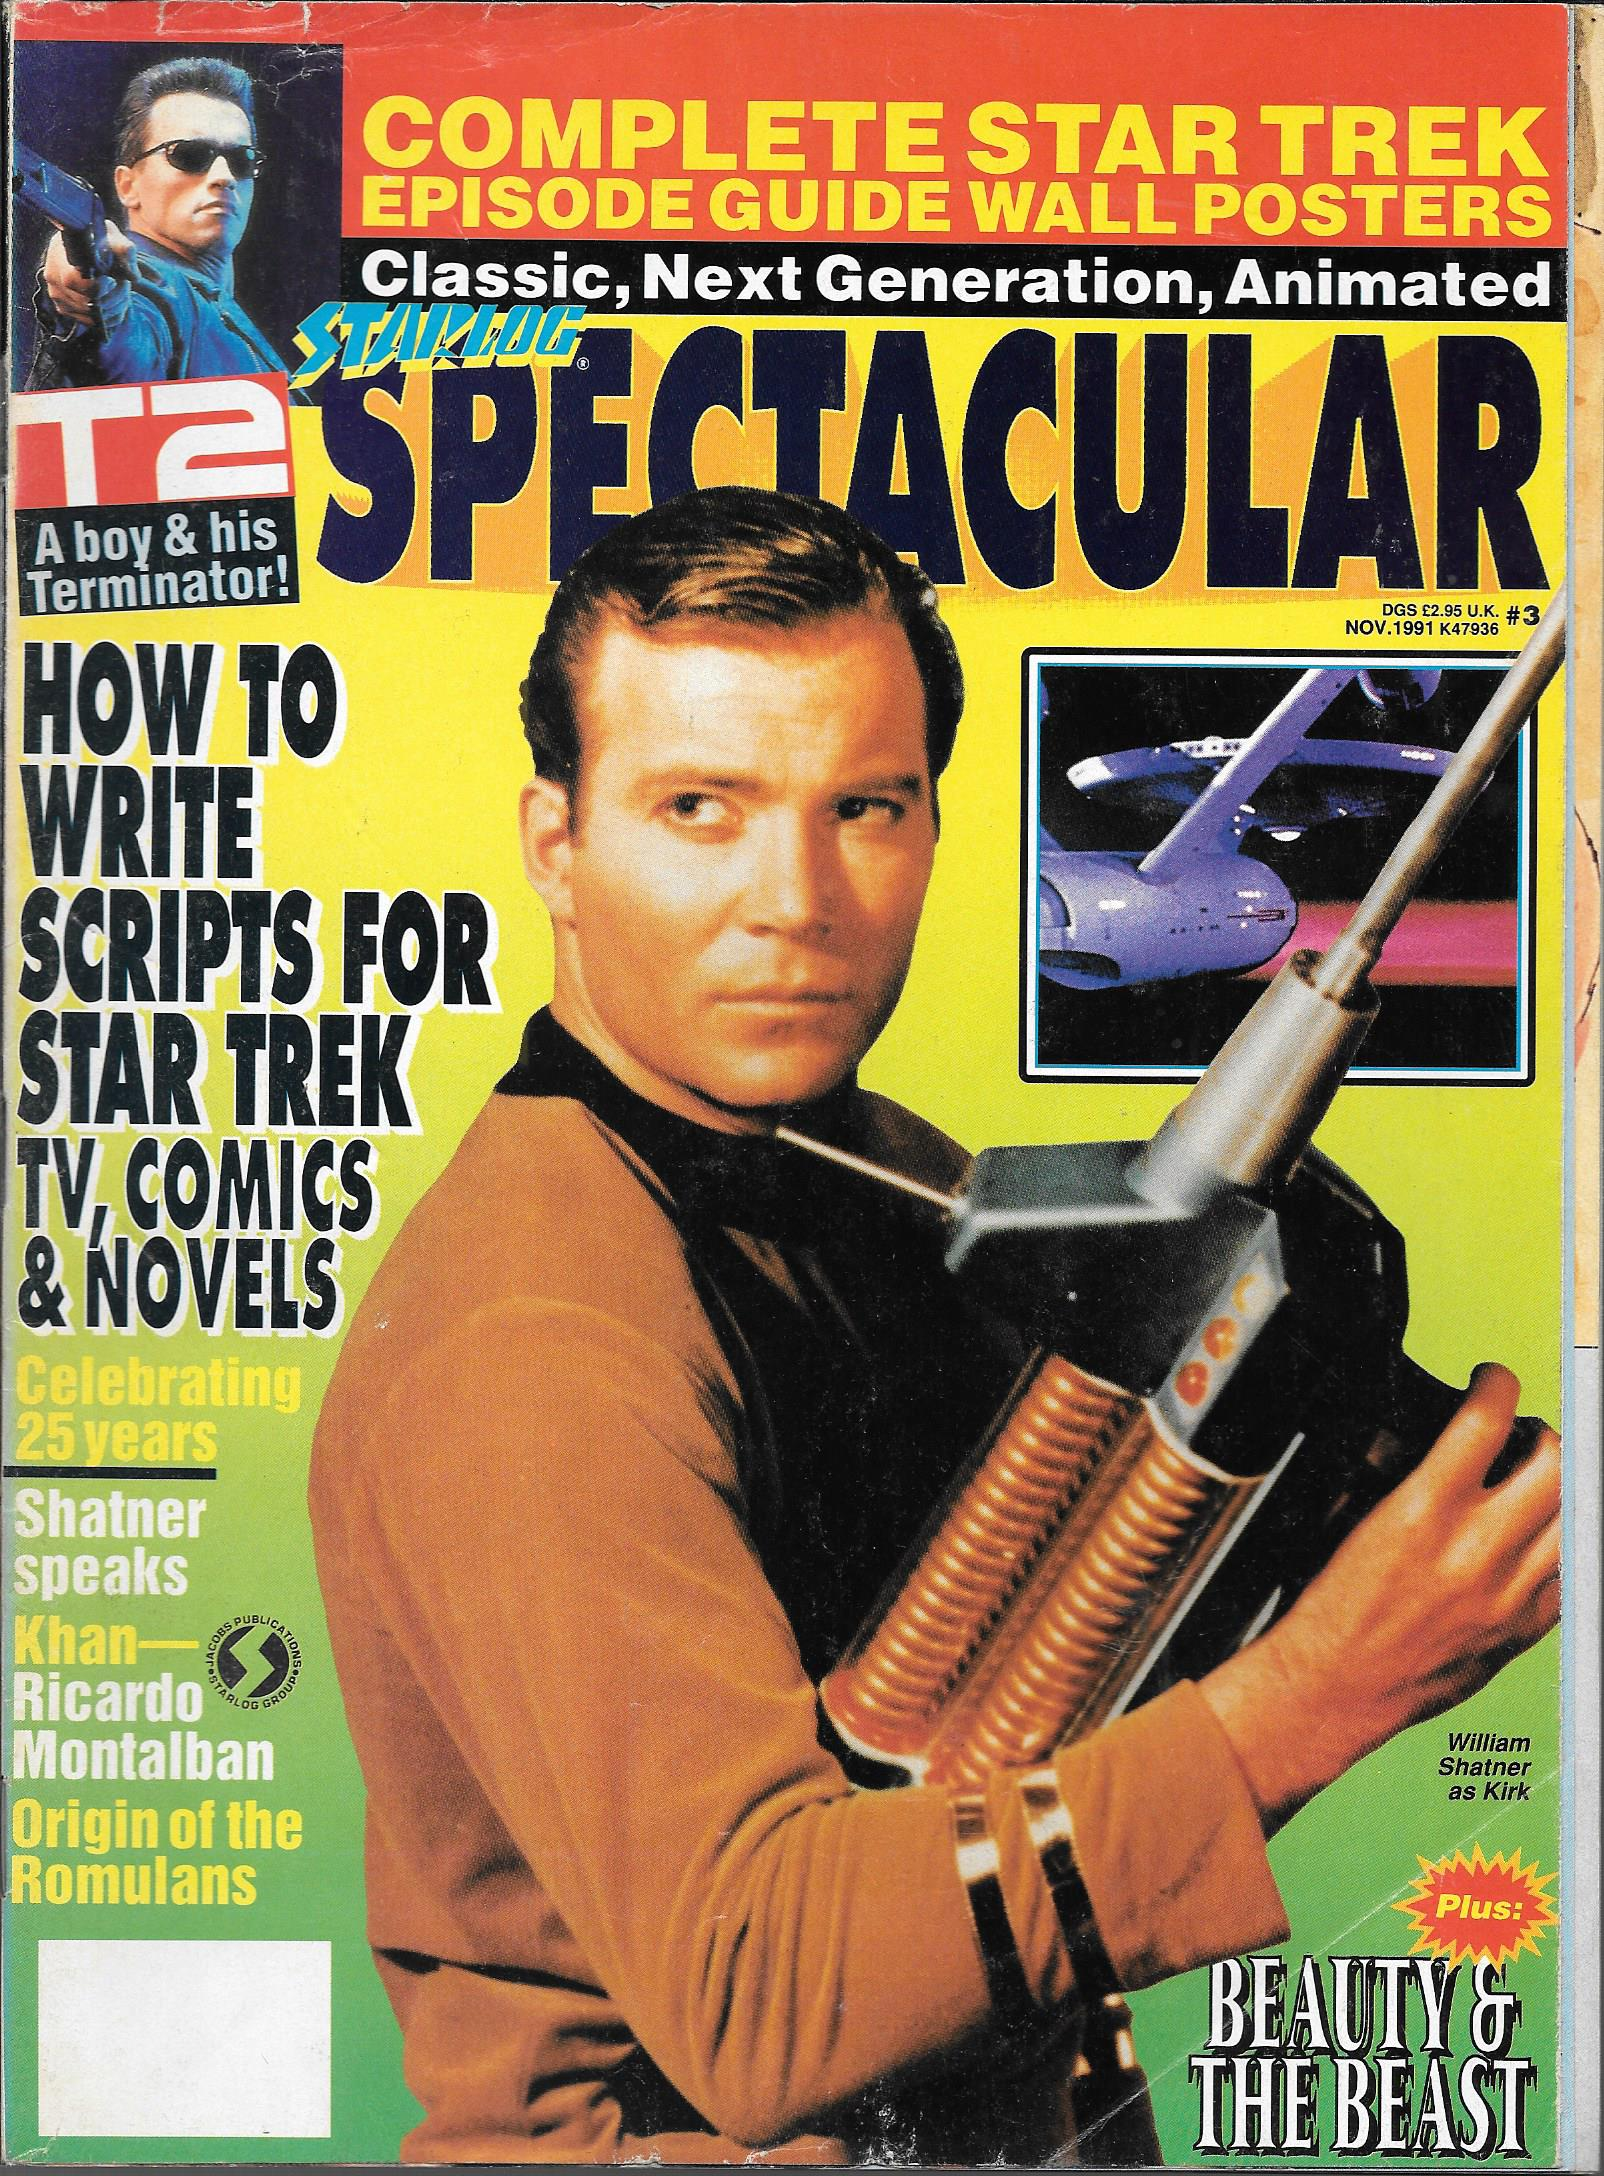 STARLOG SPECTACULAR US MAGAZINE NO 3 NOVEMBER 1991 : Vintage to Modern  Magazines